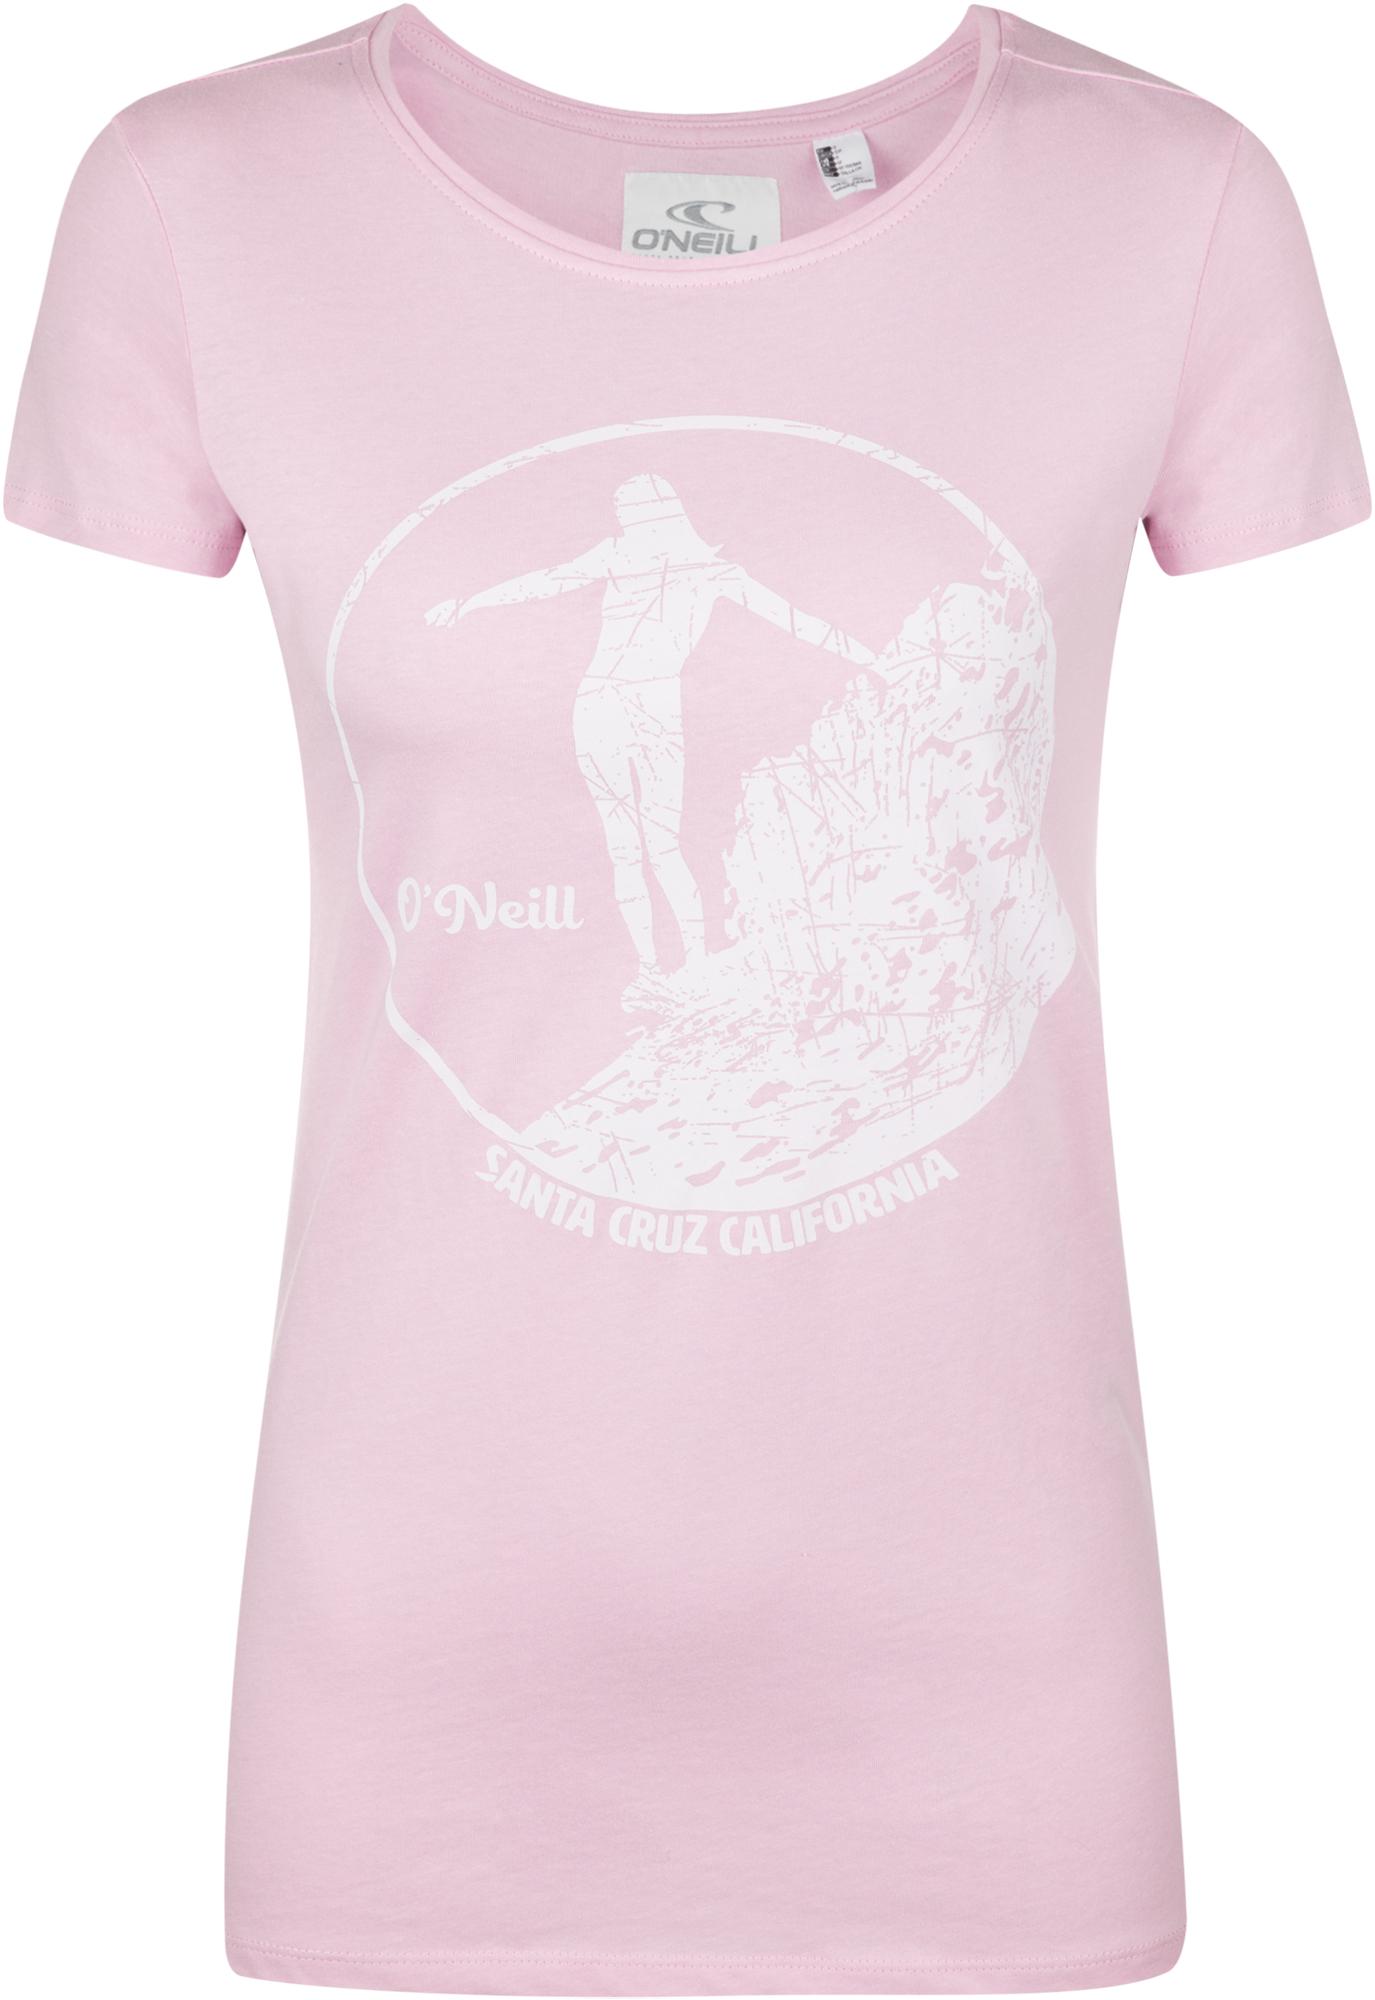 цены O'Neill Футболка женская O'Neill Santa Cruz, размер 42-44